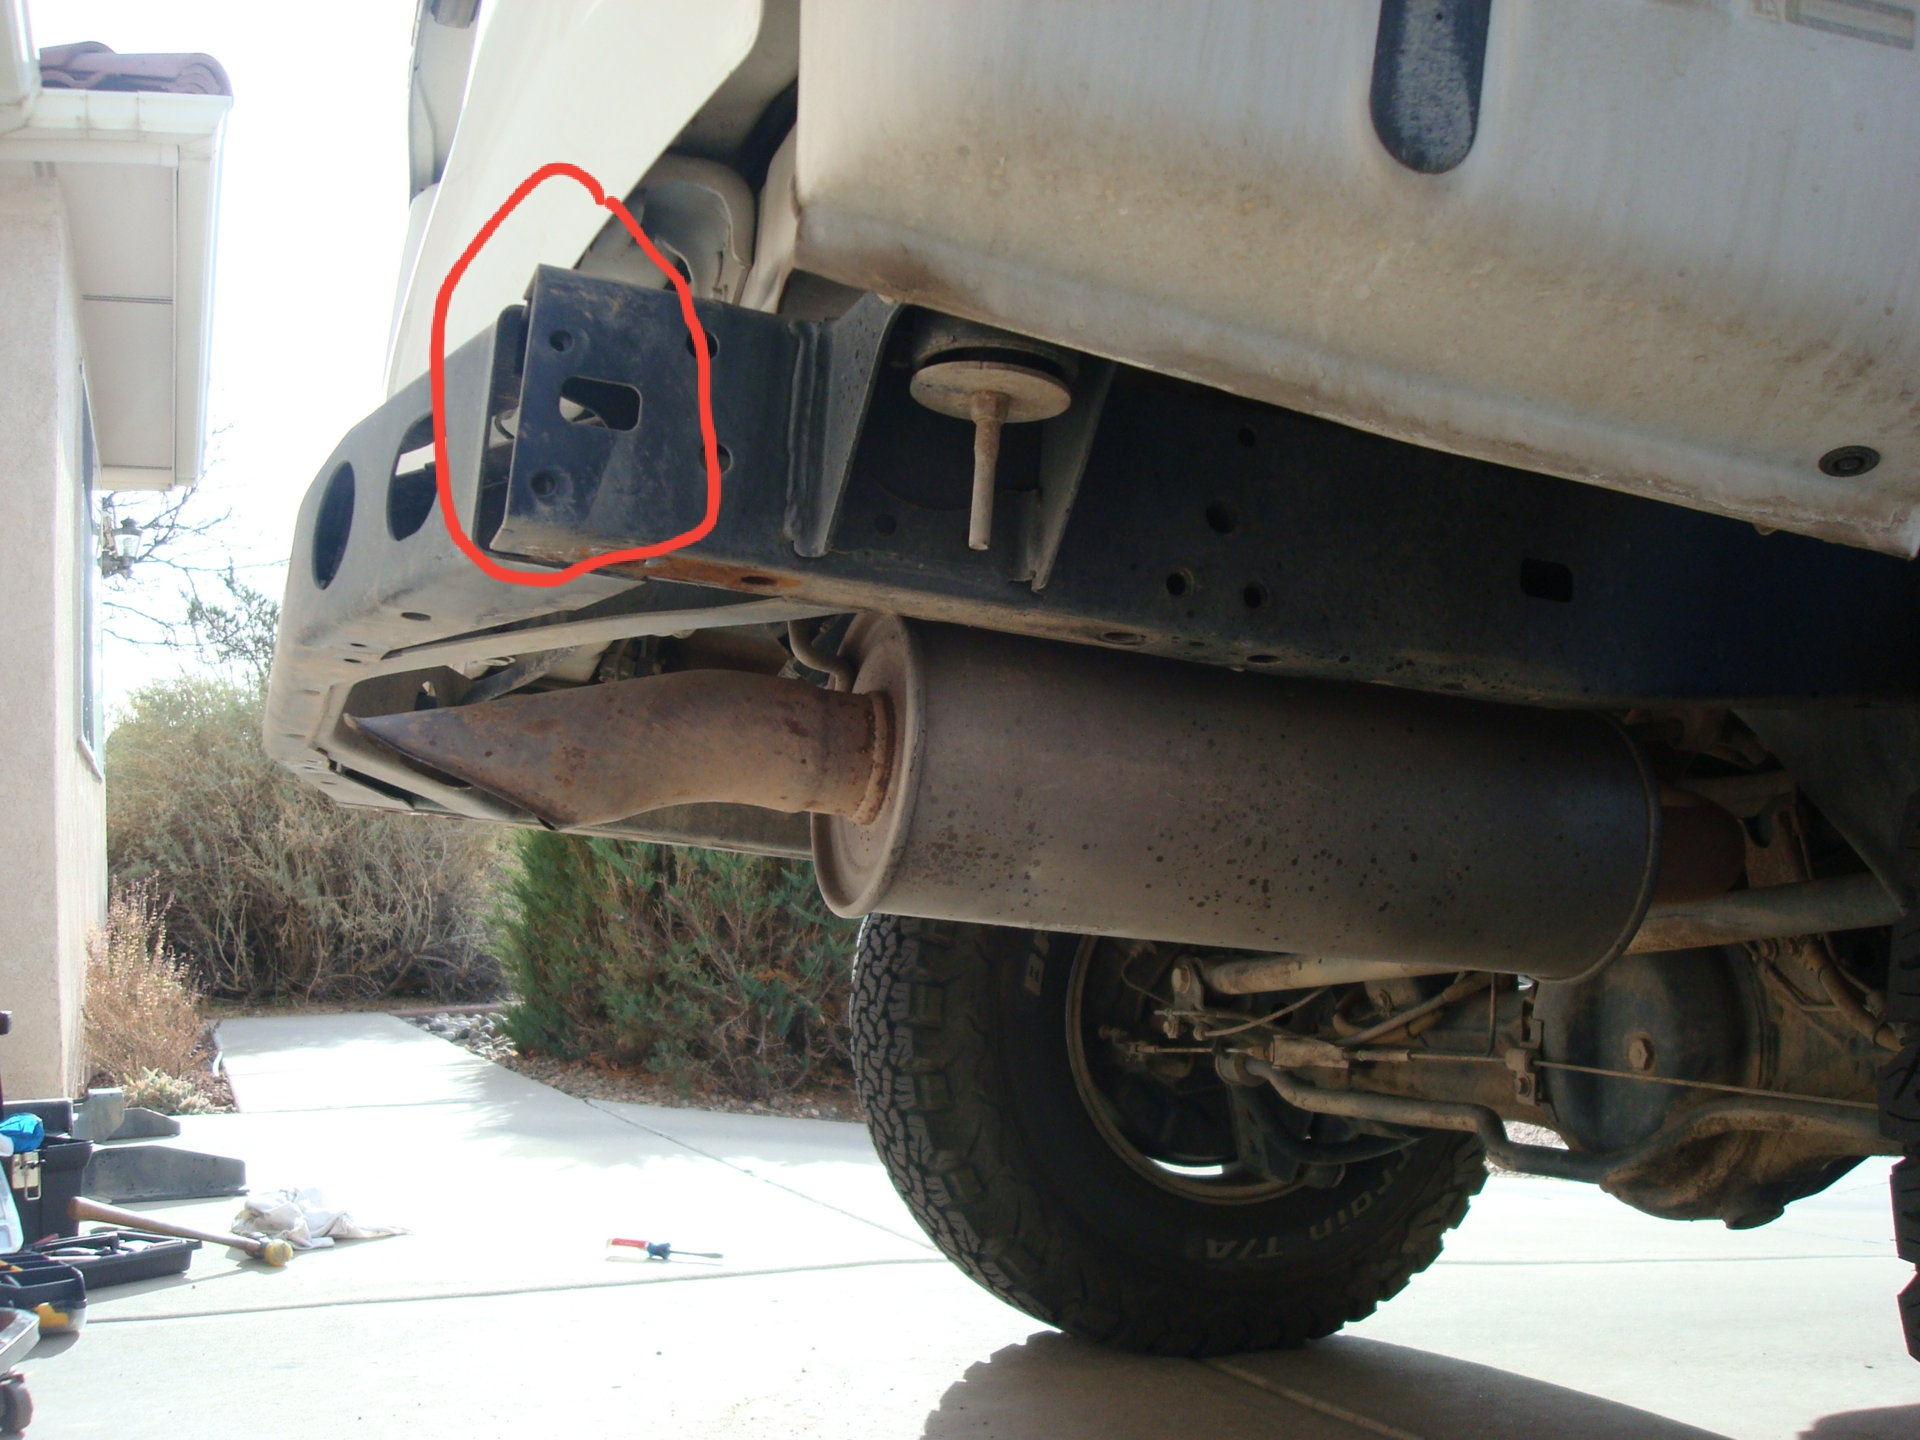 Starter Repair Near Me >> BIO Rear Bumper Install and Air Lift 1000 Repair | IH8MUD ...